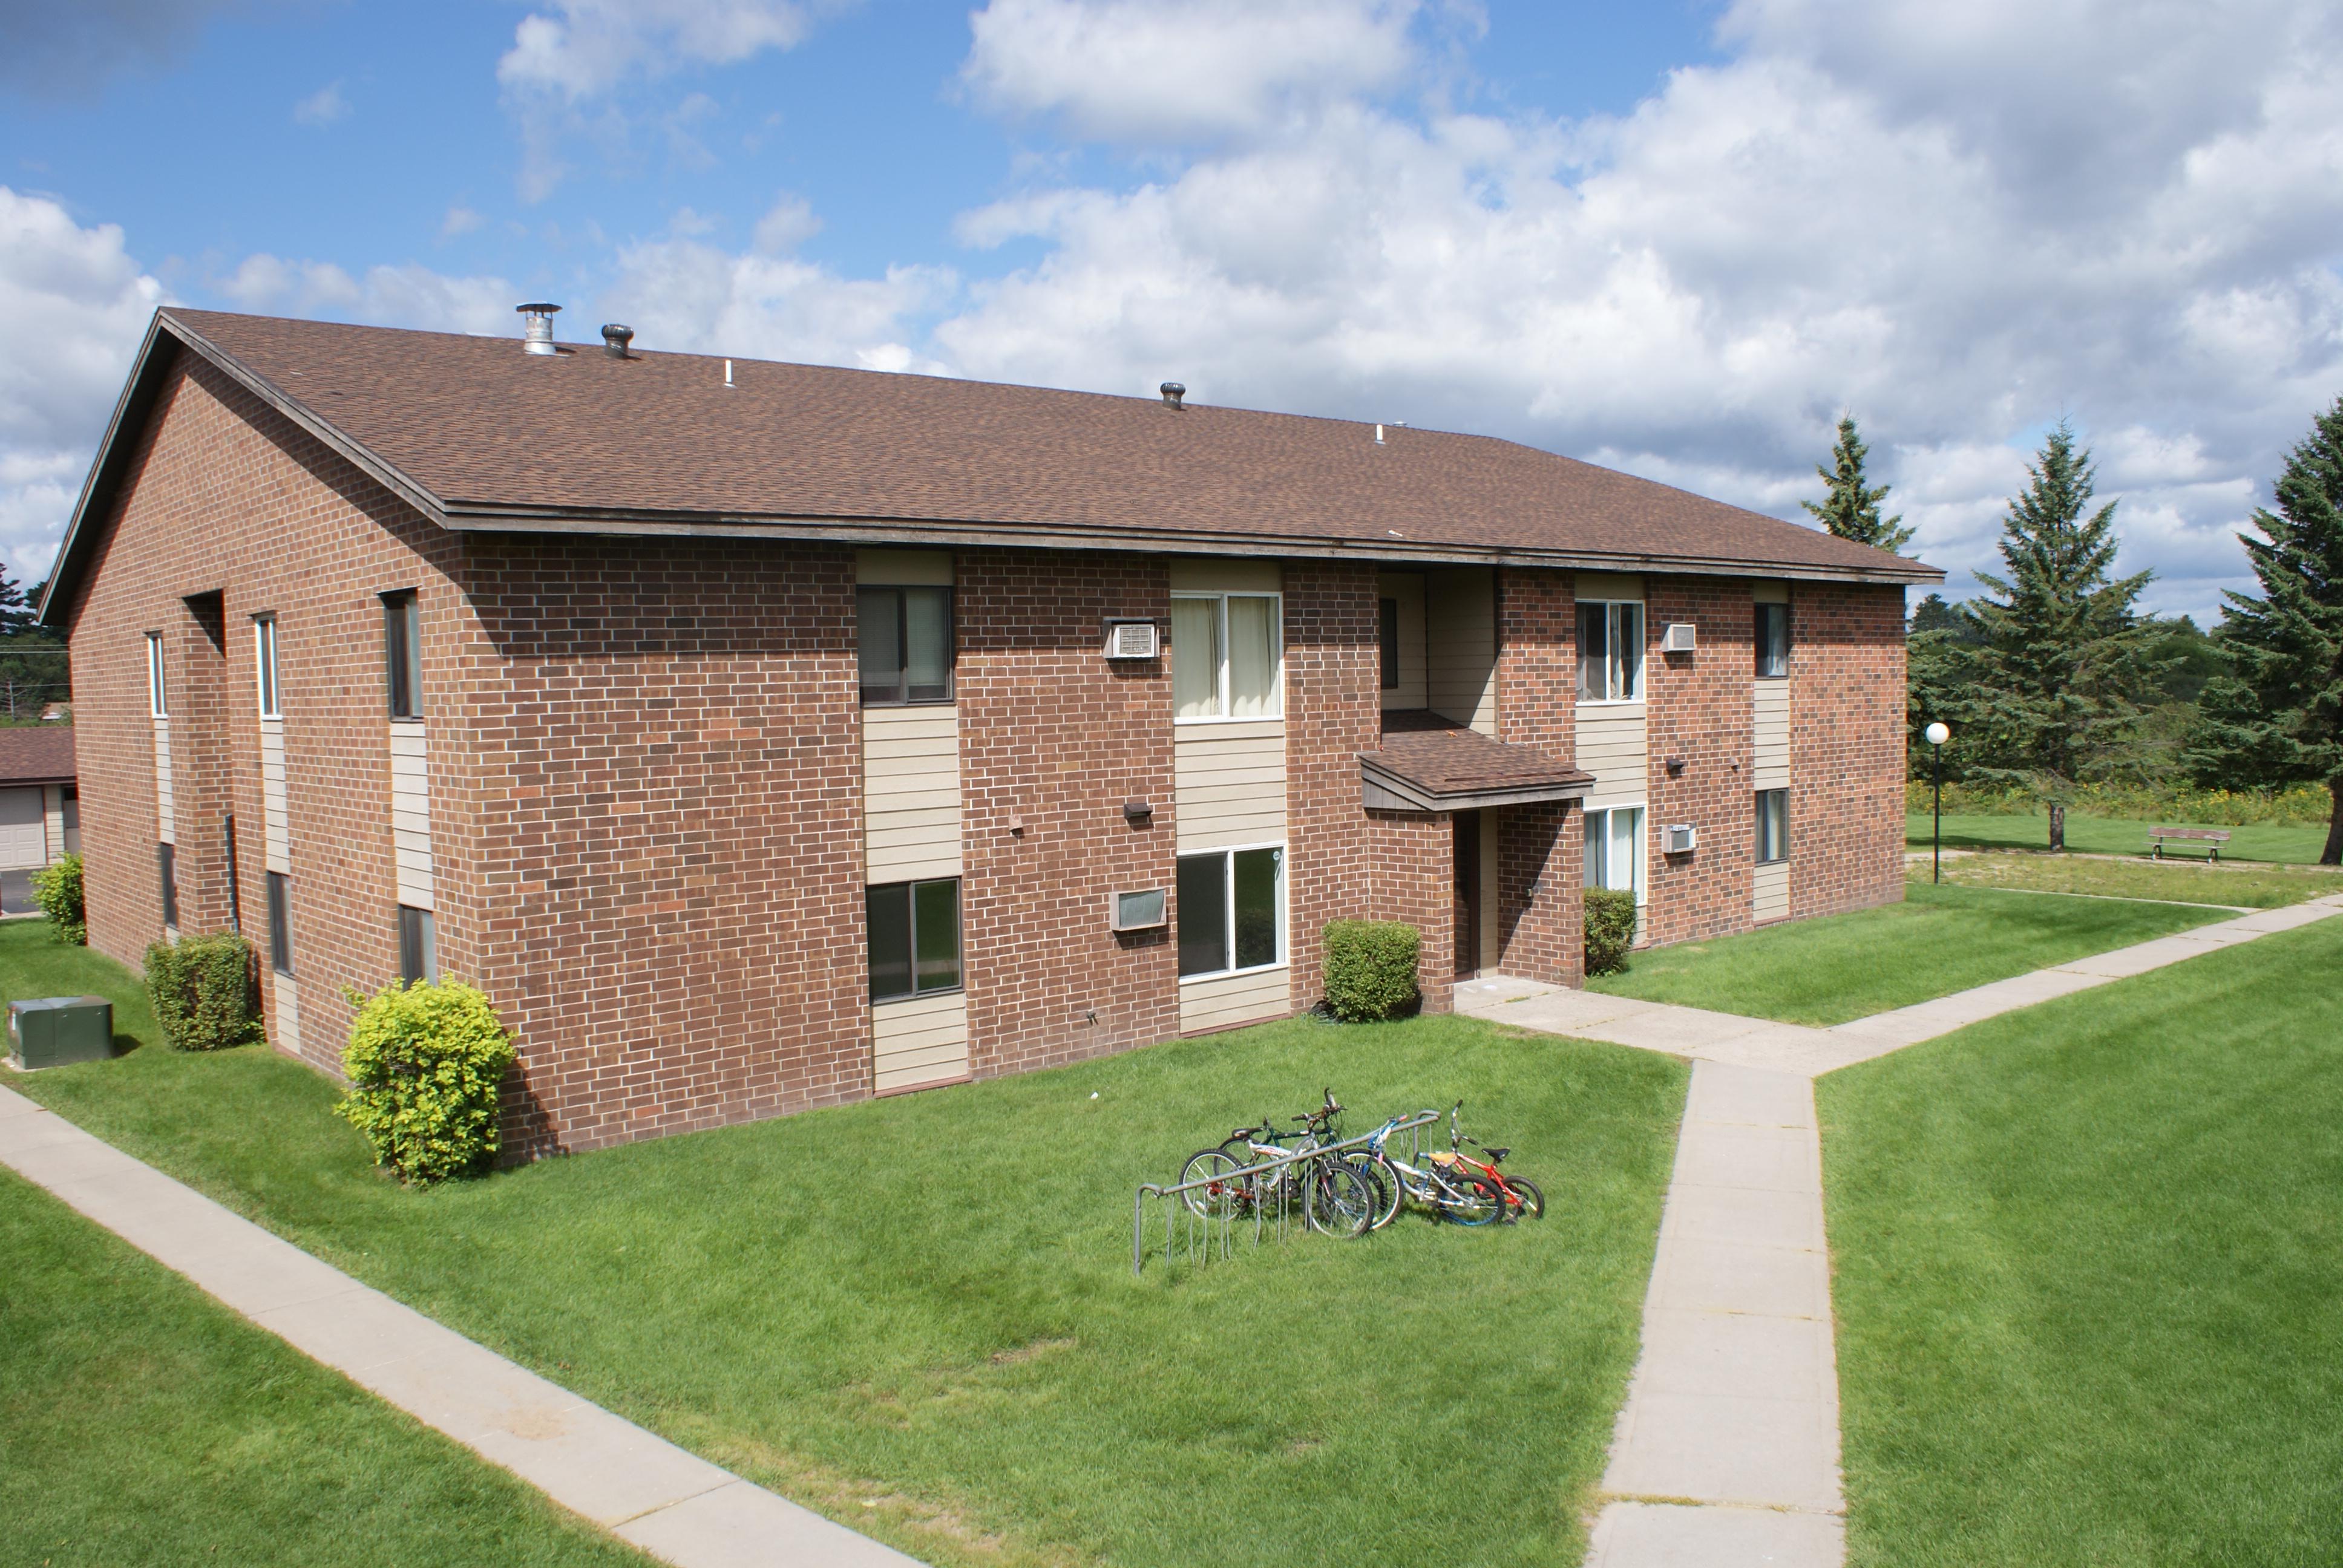 Image of Pokegama Square II Apartments in Grand Rapids, Minnesota